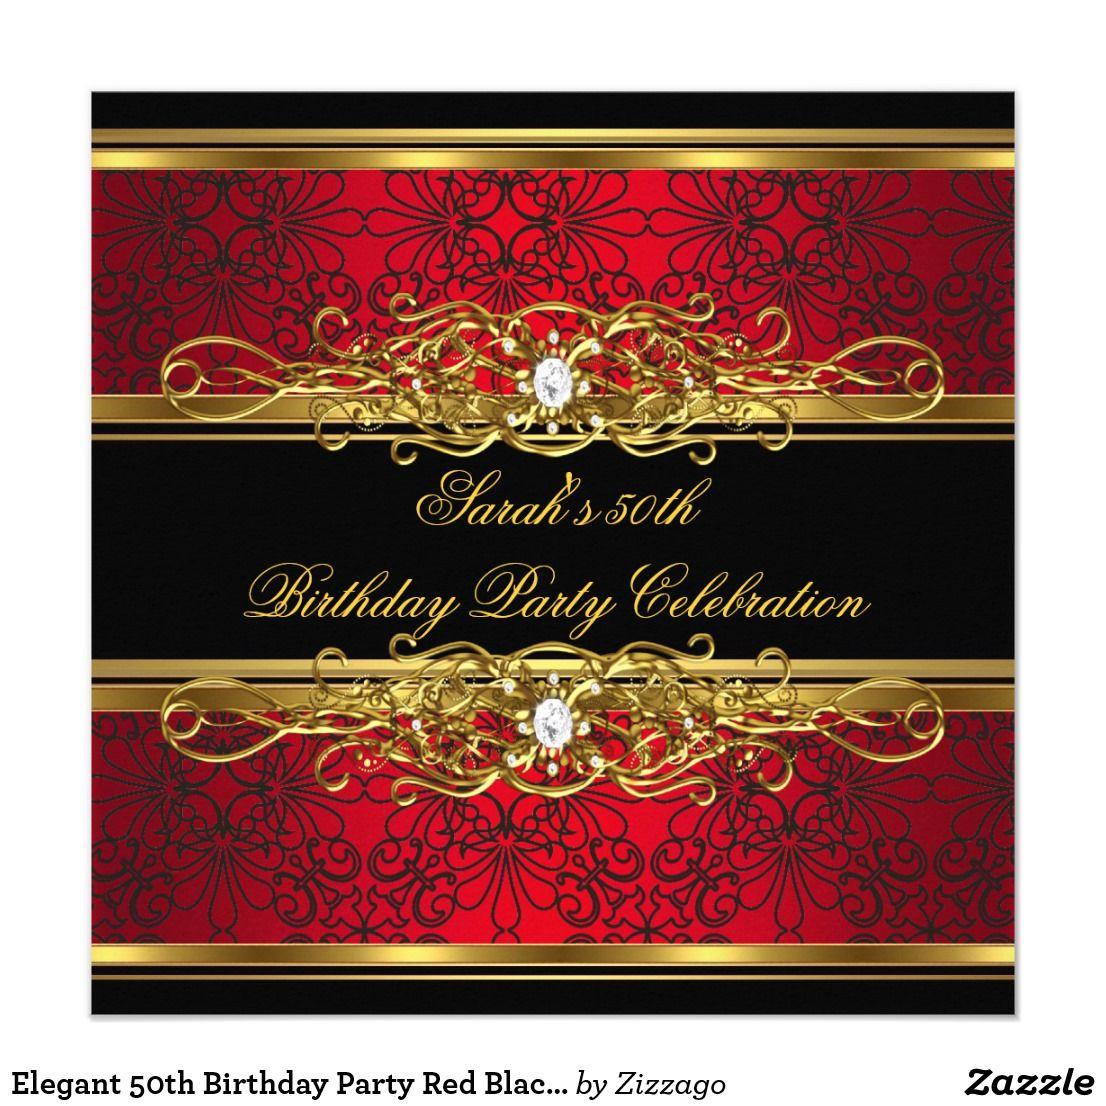 Elegant 50th Birthday Party Red Black Gold Damask Invitation   Zazzle.com   Black  gold party, Damask invitations, 50th birthday invitations